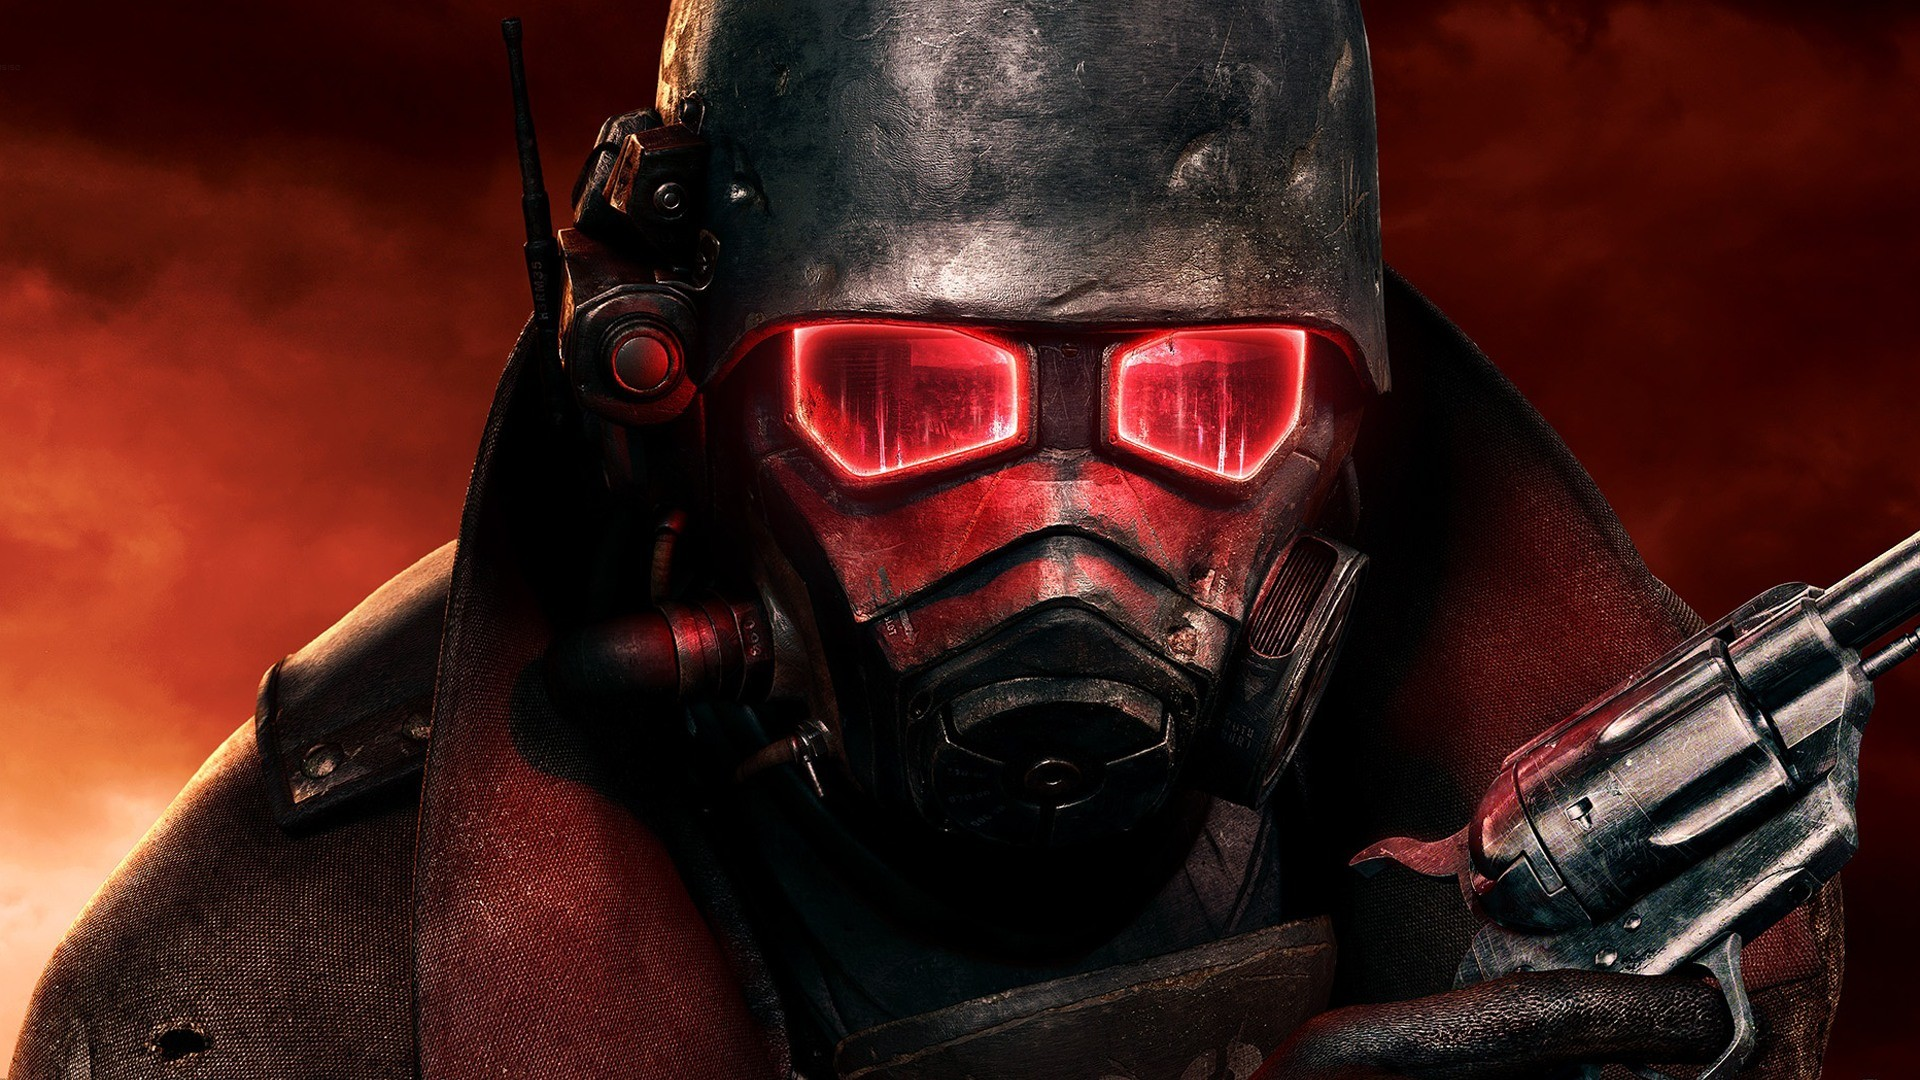 Fallout Ncr Ranger Wallpaper ·① WallpaperTag